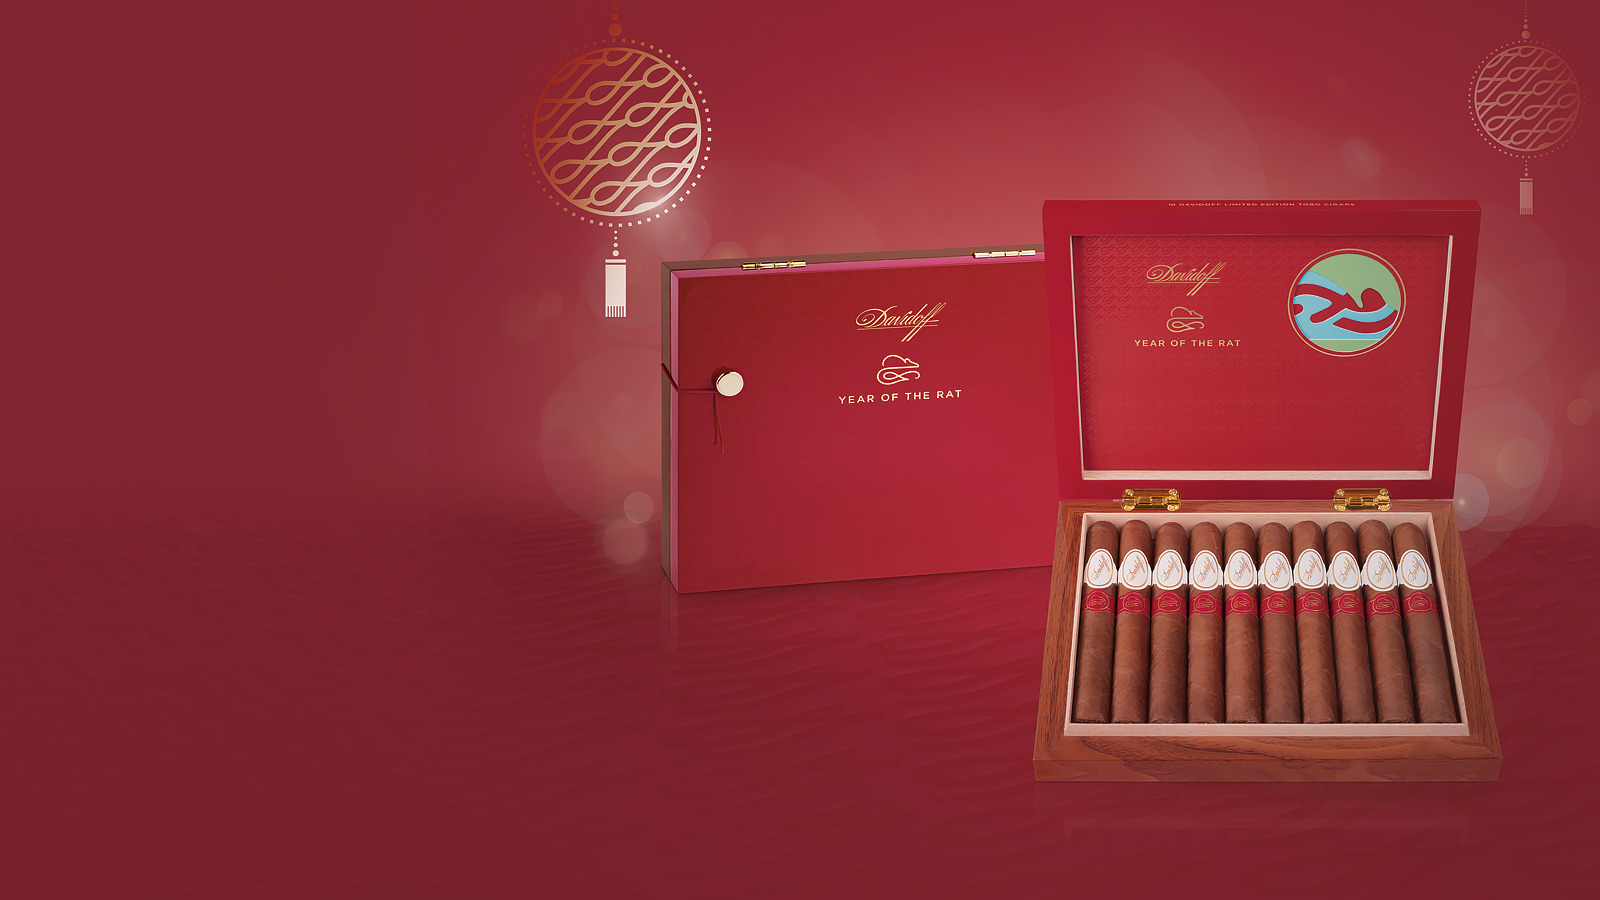 Davidoff  Cigars: Year of the Rat